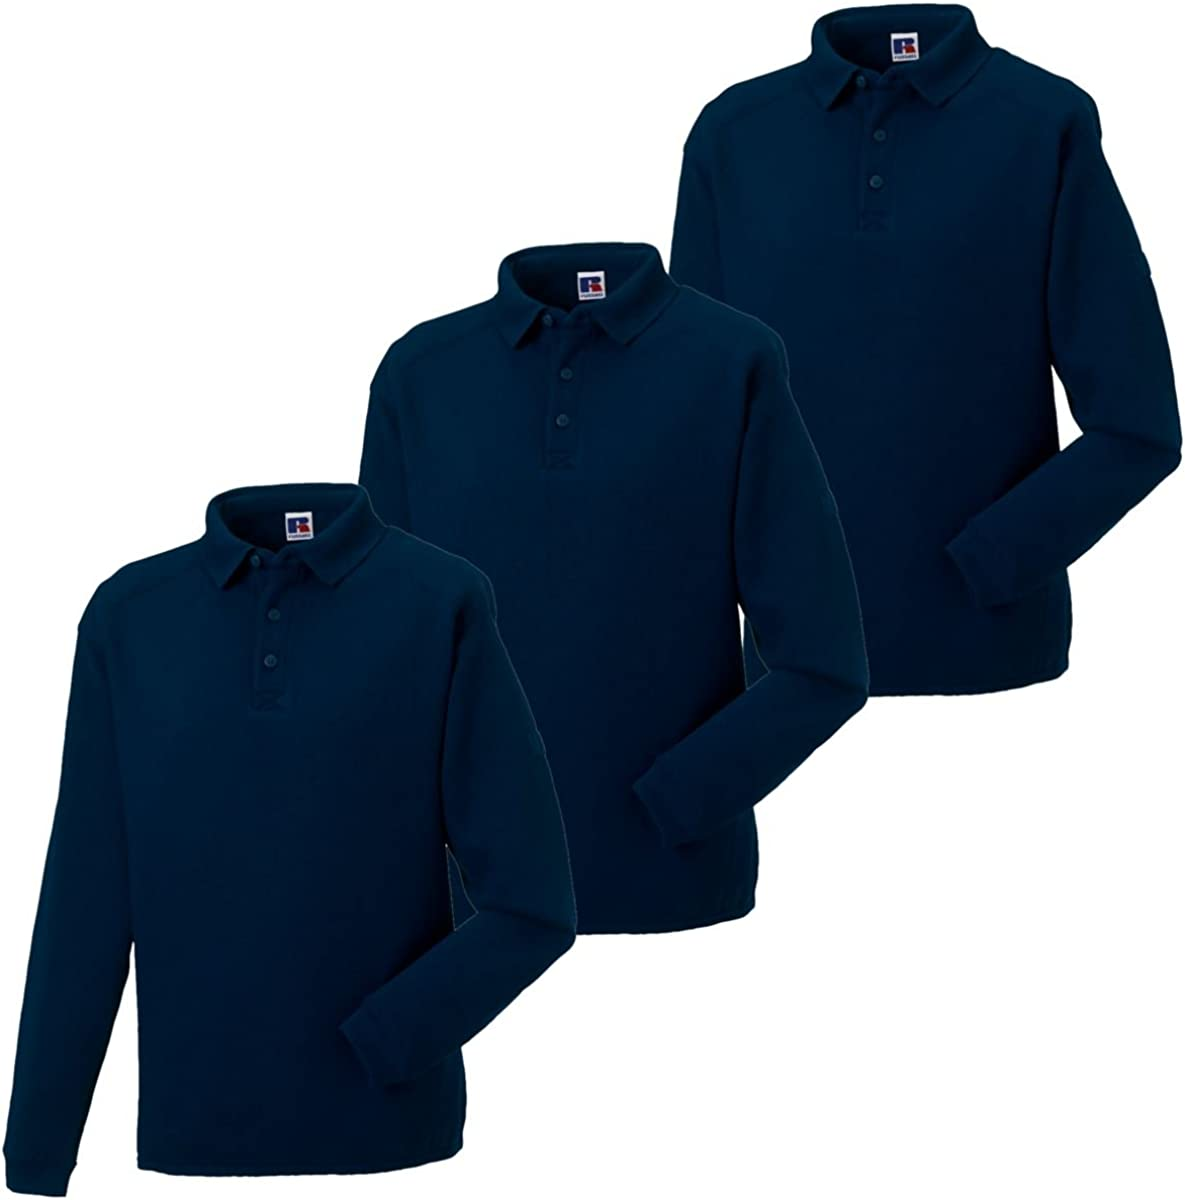 sunnymi 1-6 Years Kids Baby Warm Girls Boys Flannel Winter Fleece Jackets Sweatshirt Hooded Coats